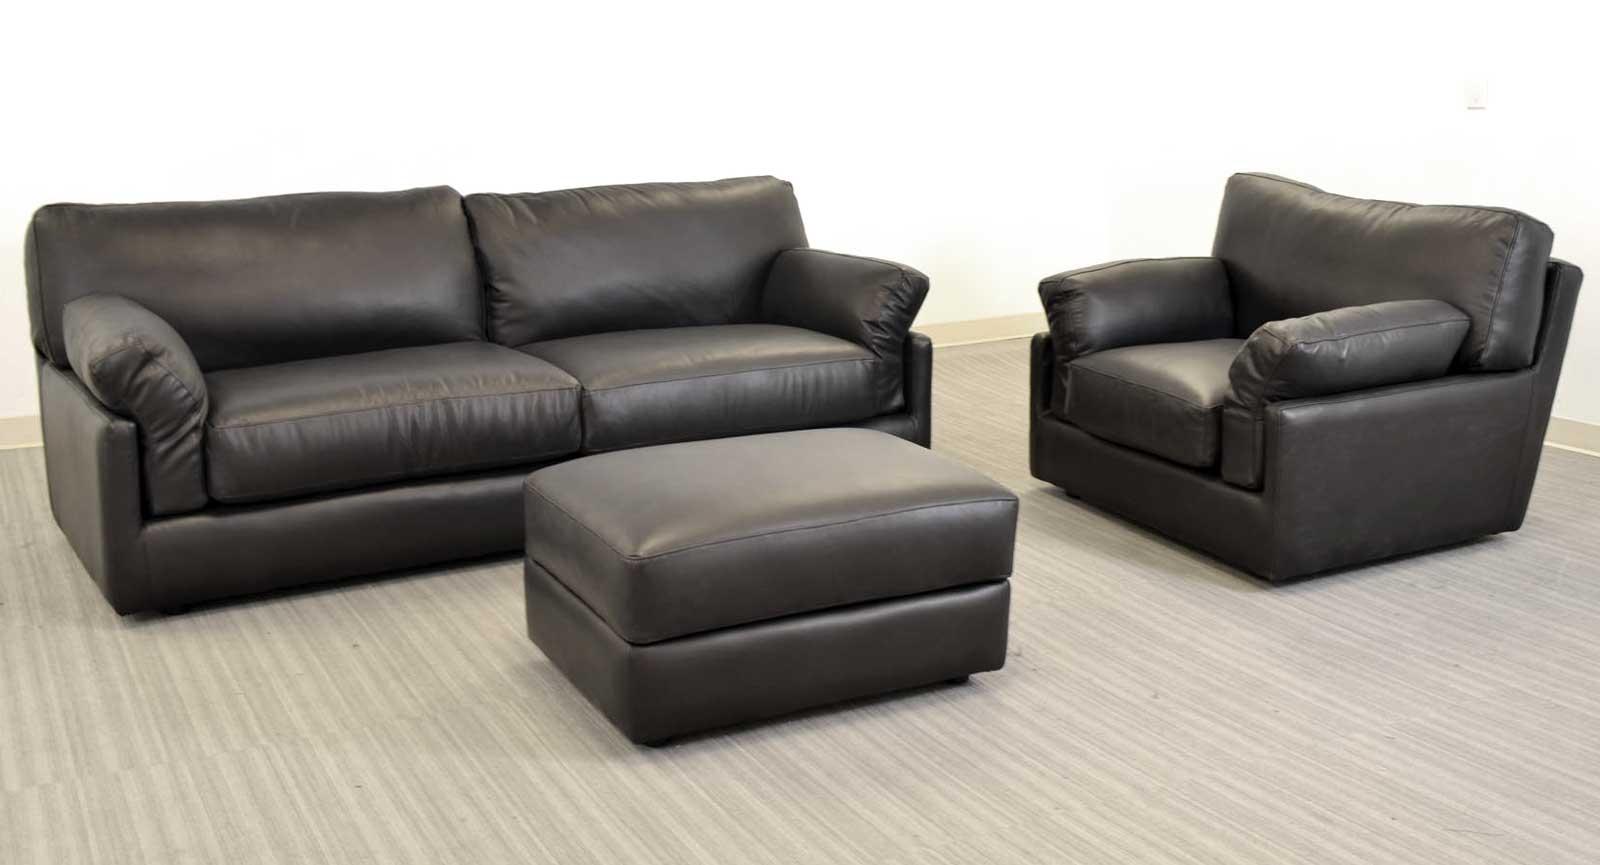 Sofa Chair And Ottoman Bisenti Chair And A Half Ottoman